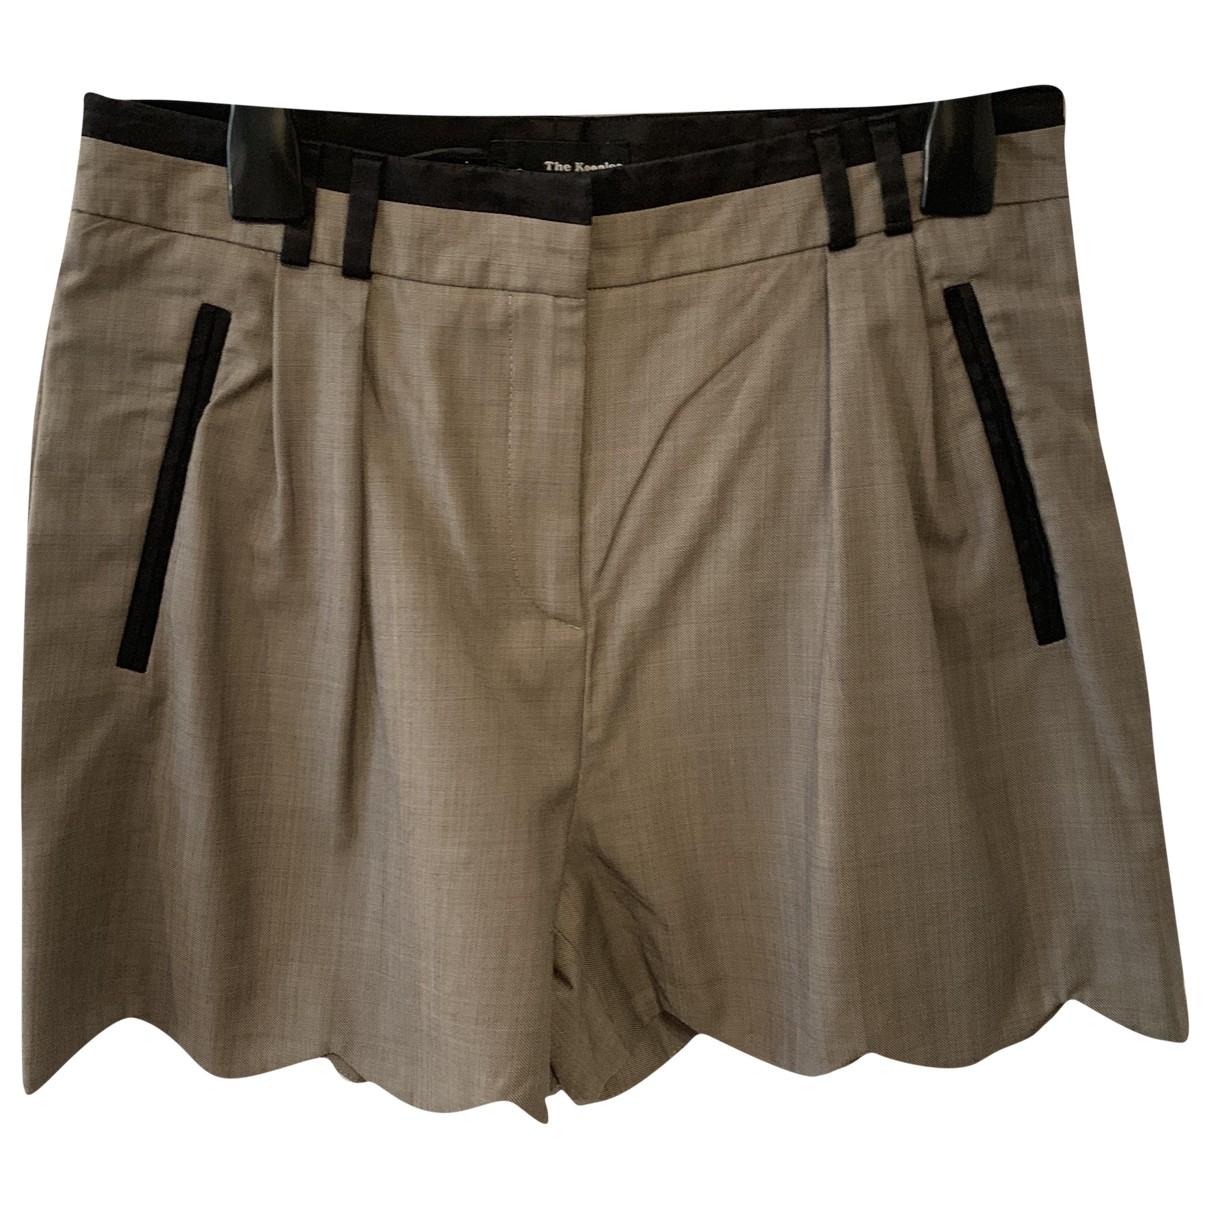 The Kooples \N Beige Cotton Shorts for Women 38 FR